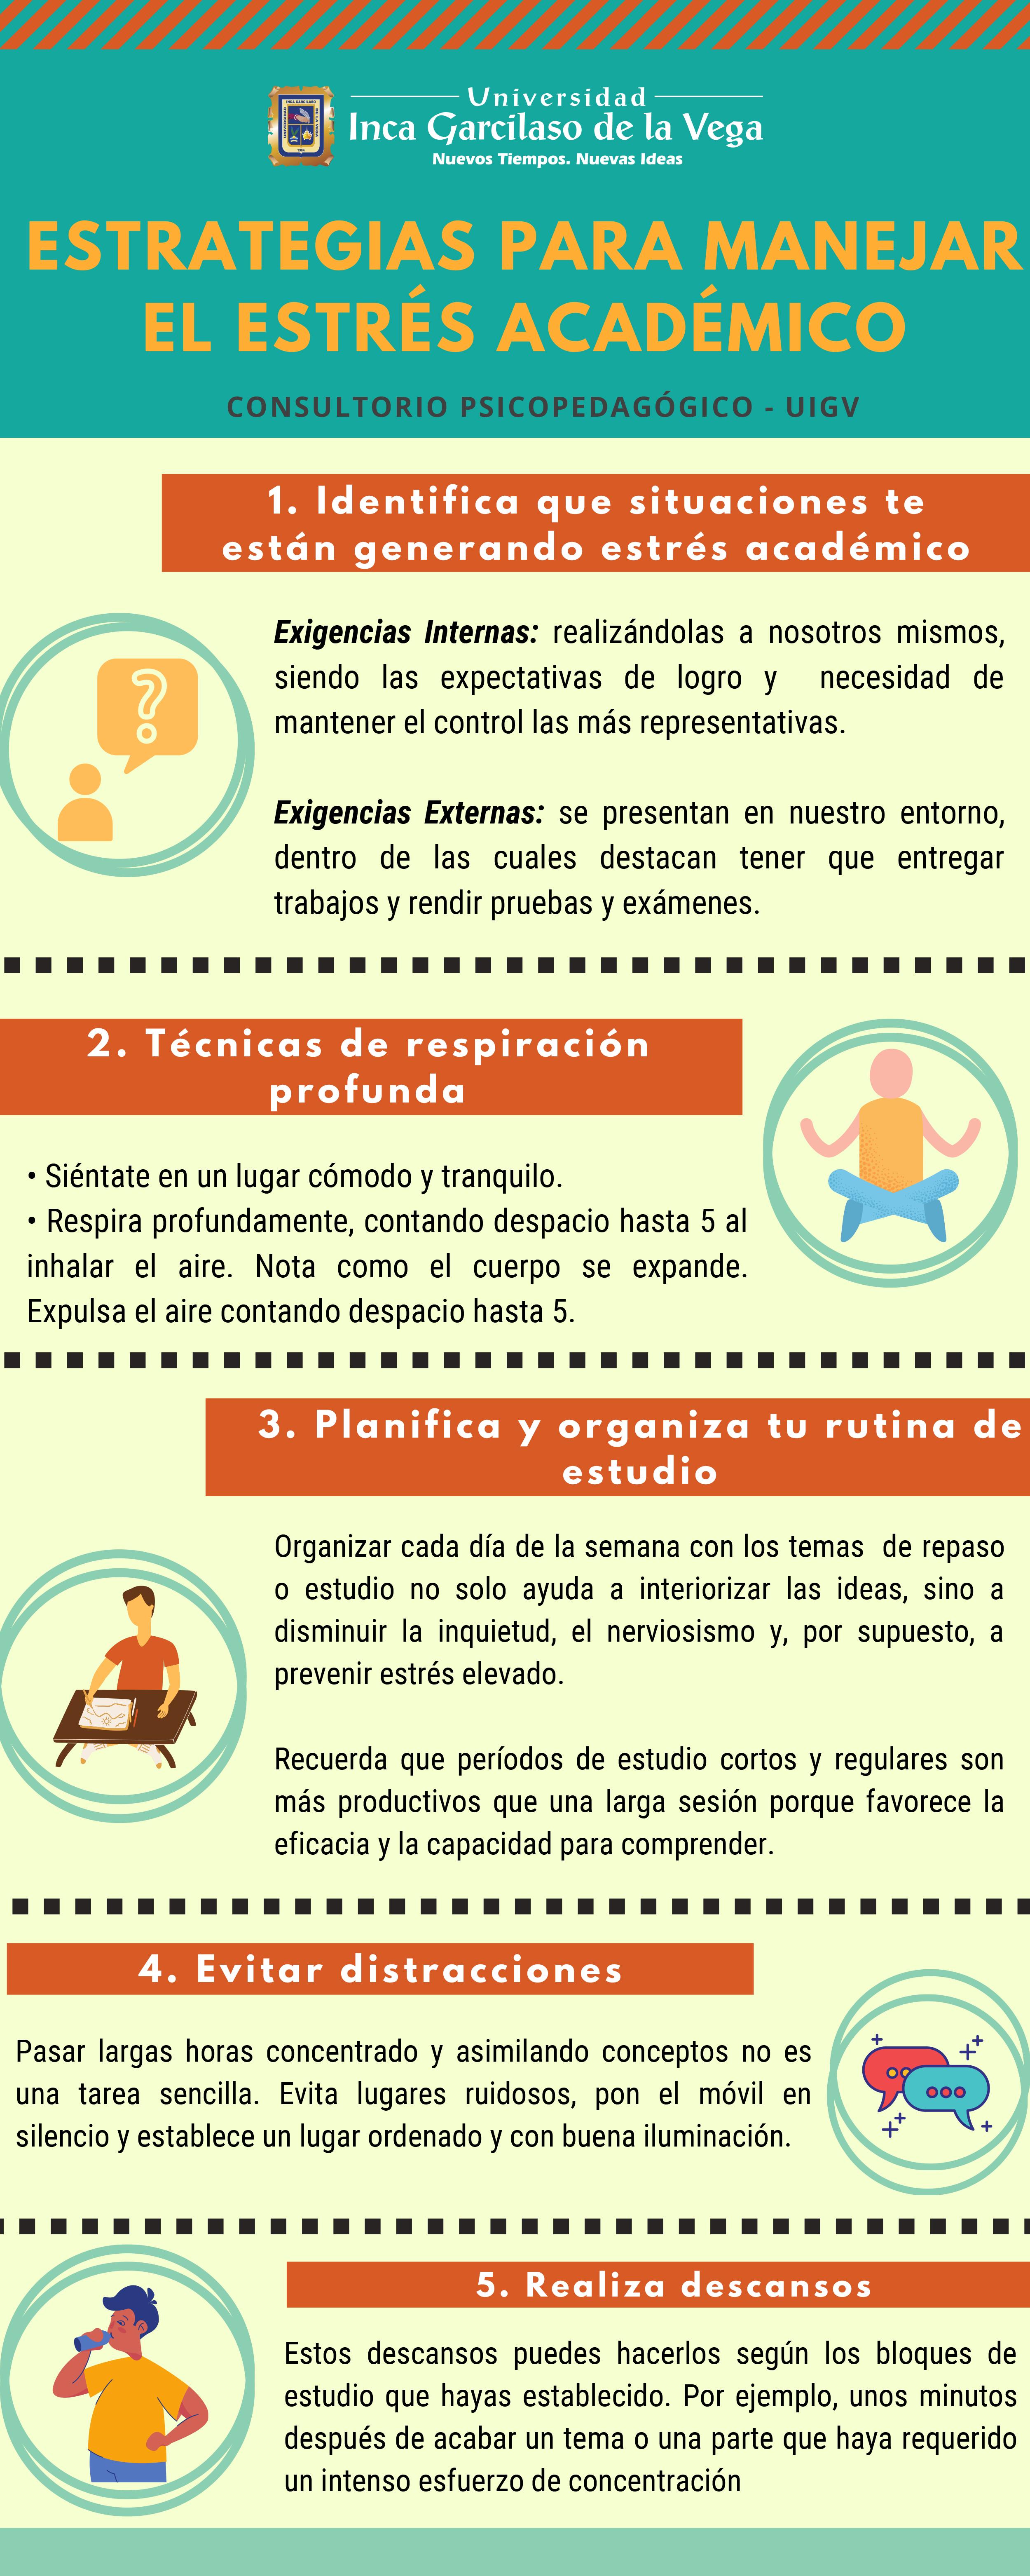 Negro Naranja Verde Redes Sociales Iconos Negocios Empresa Infog